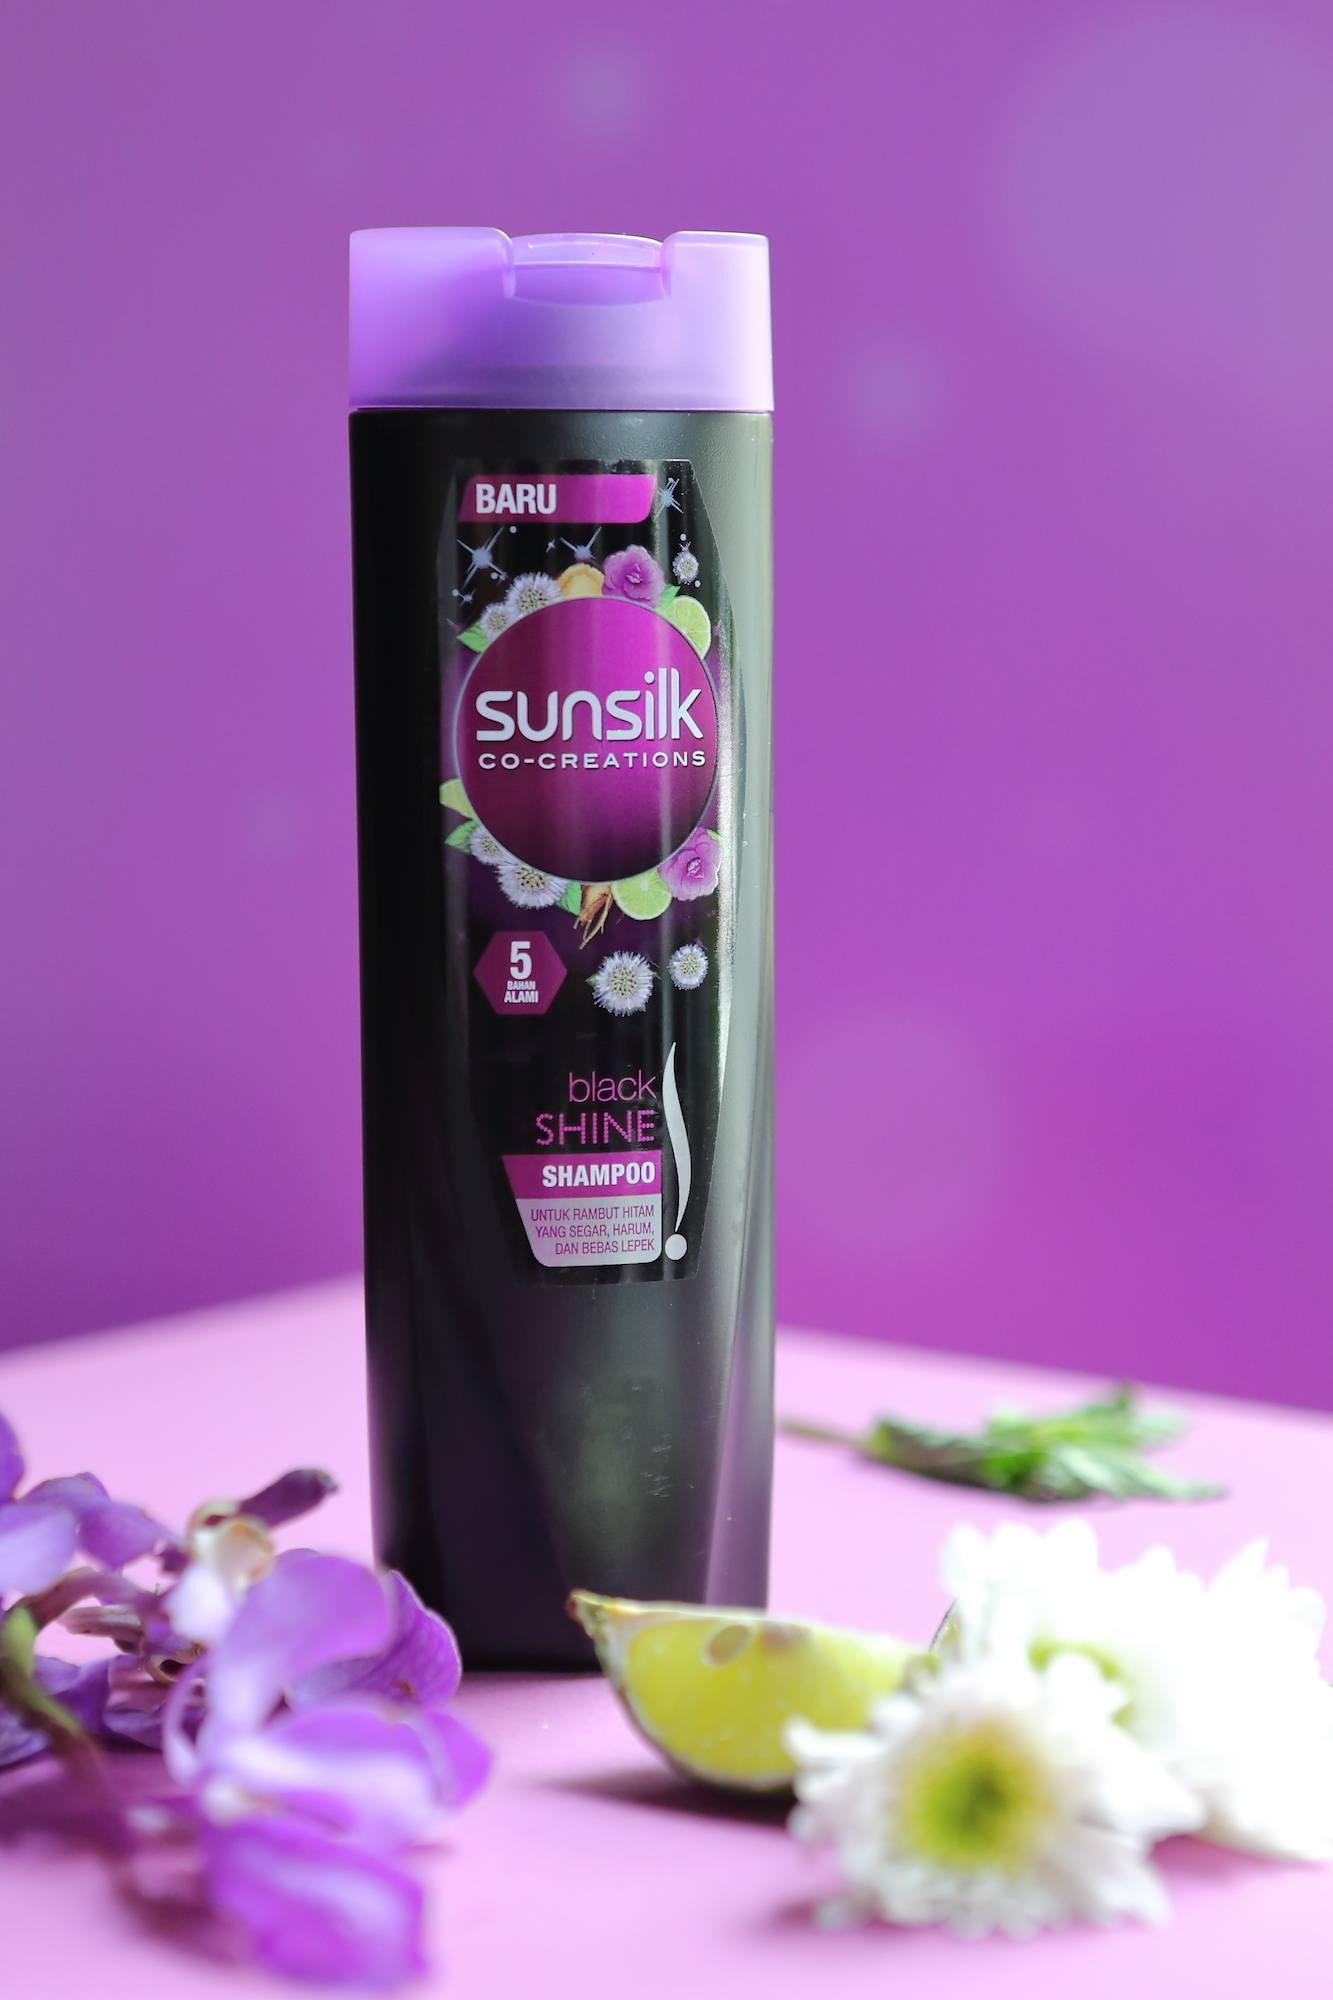 Botol Sunsilk Black Shine Shampoo pada campaign Tak Terhentikan